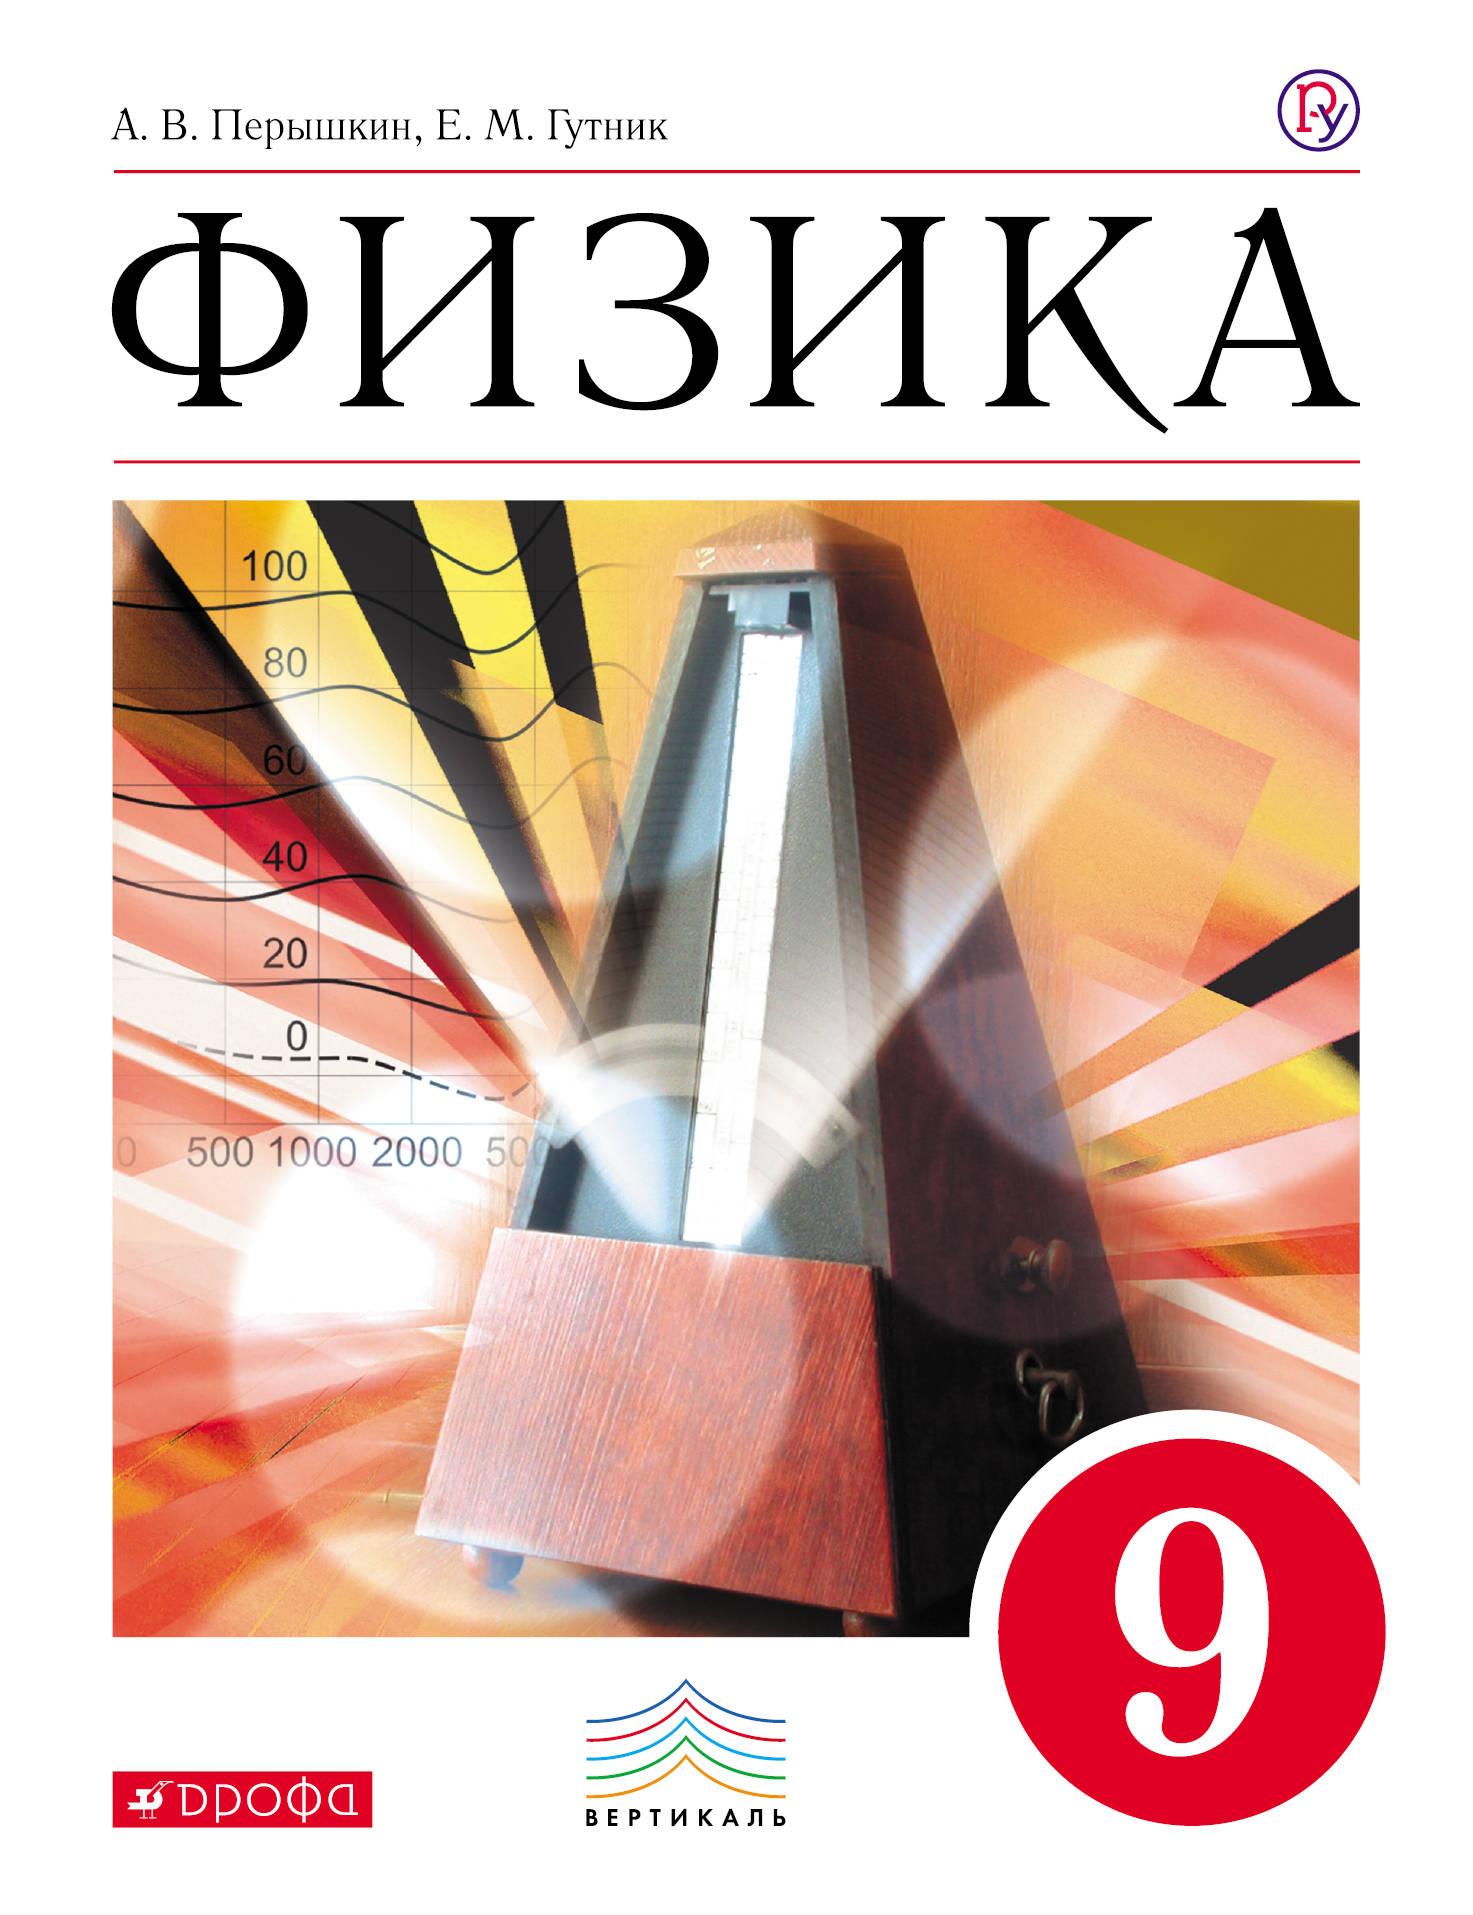 Перышкин А.В., Гутник Е.М. Физика. 9 класс. Учебник физика 9 класс